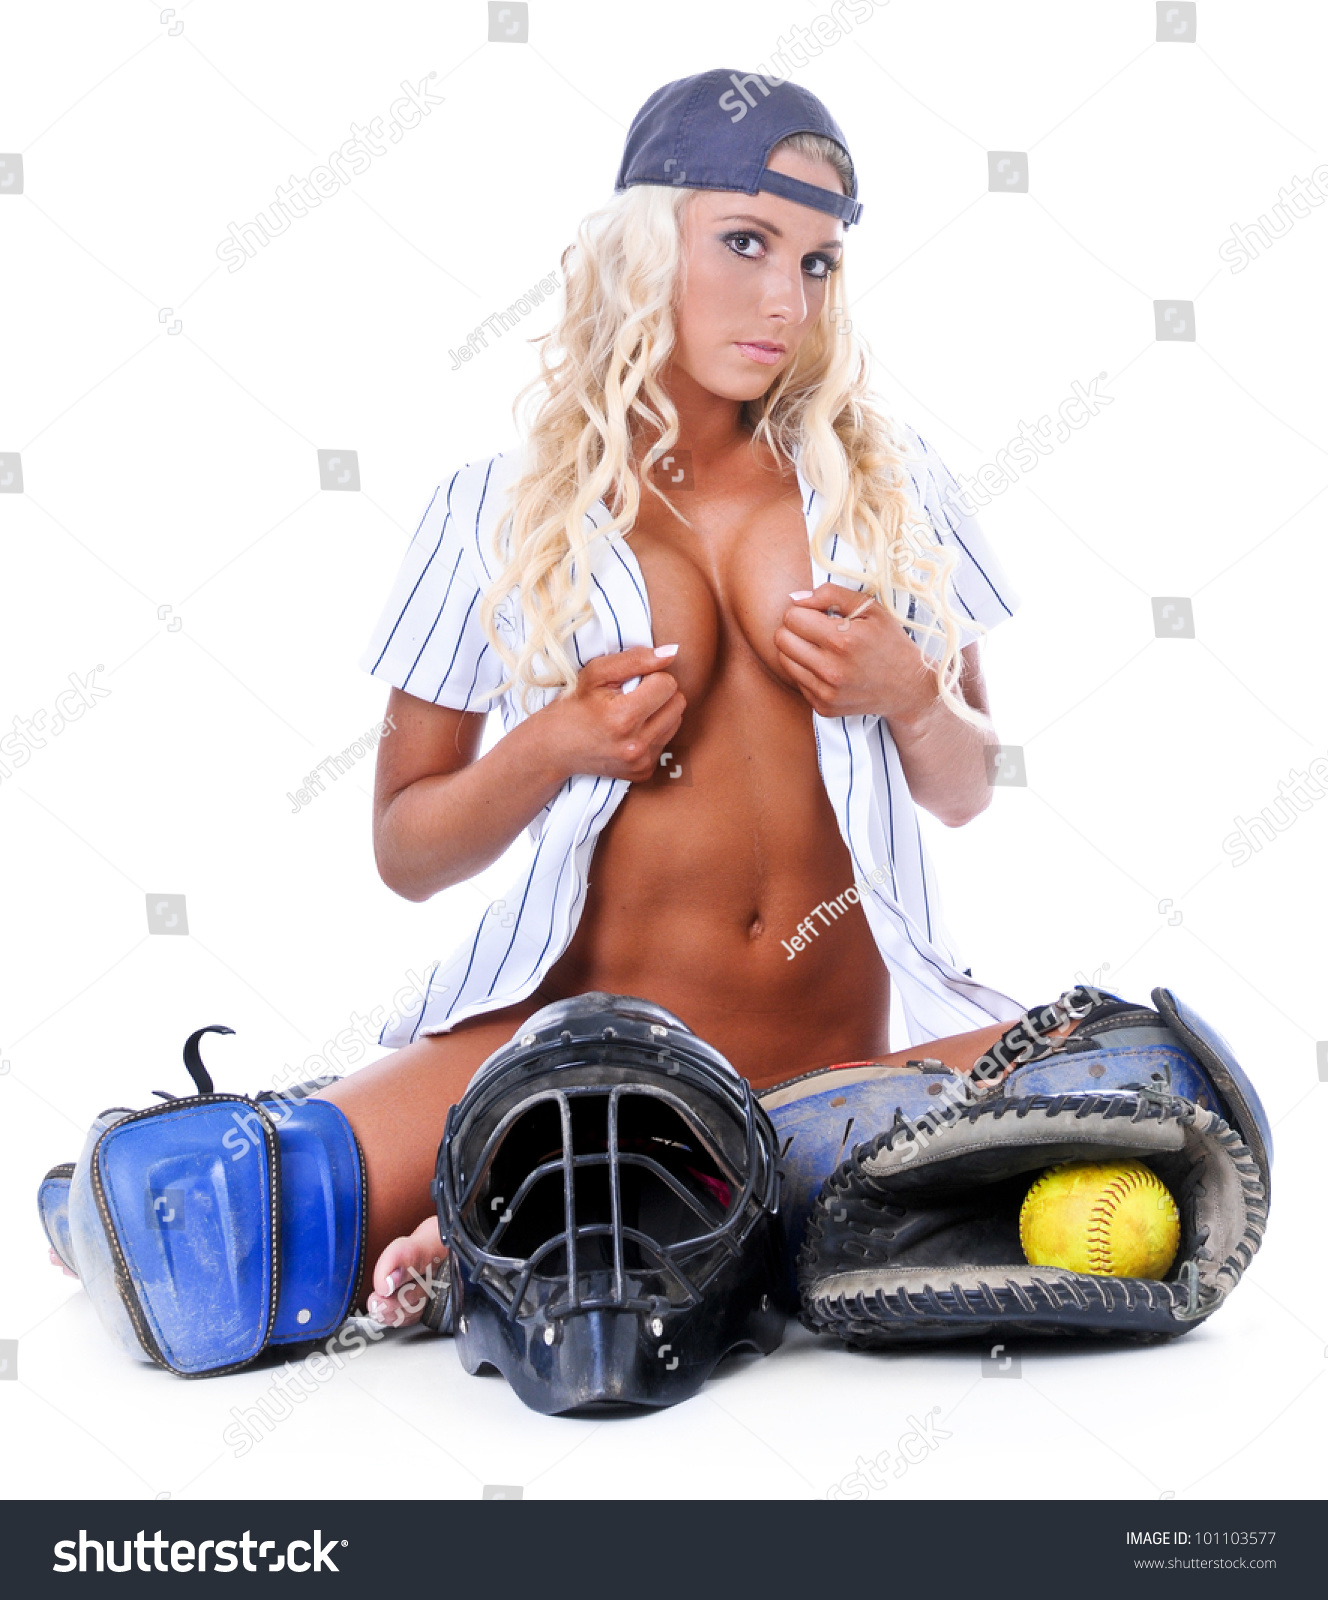 Nude girls wearing baseball cap good